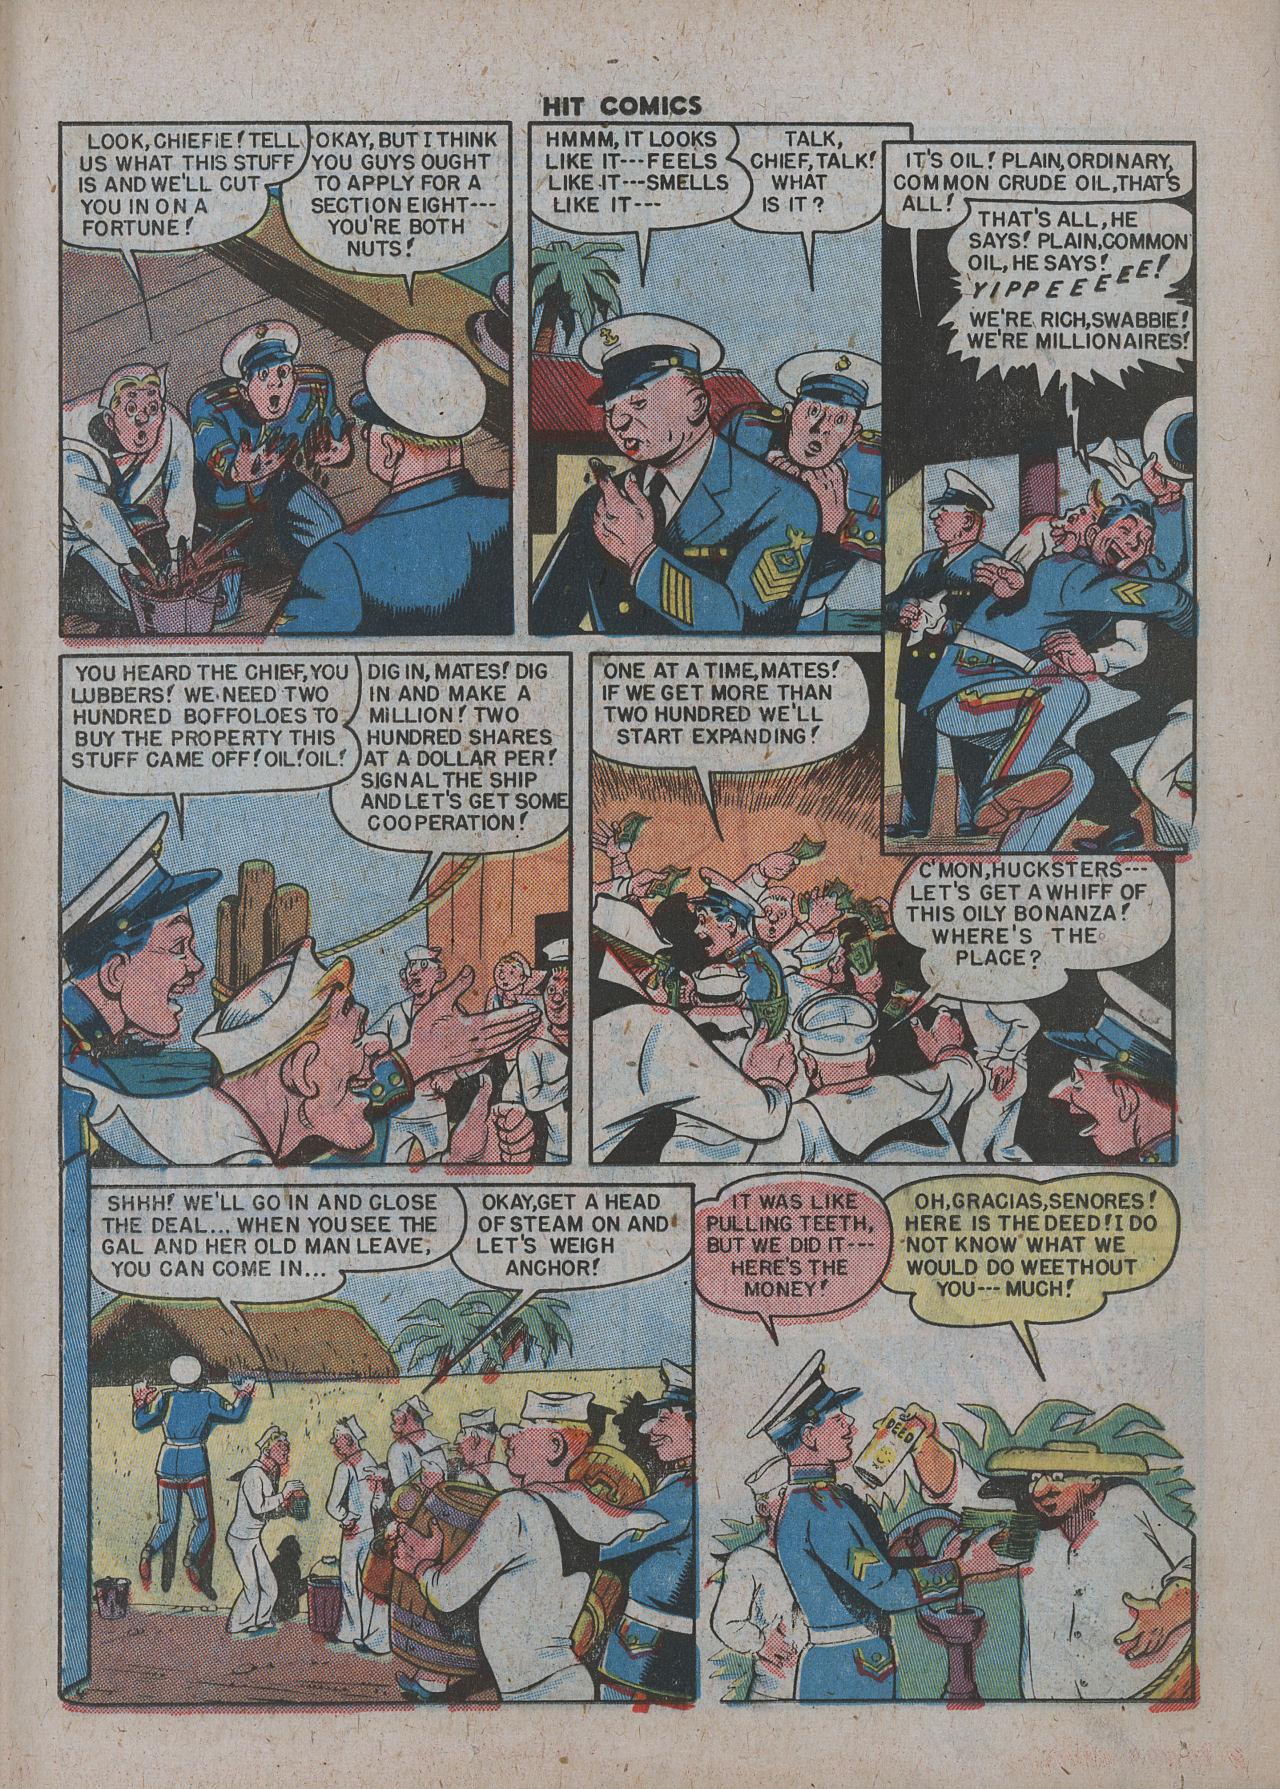 Read online Hit Comics comic -  Issue #63 - 25